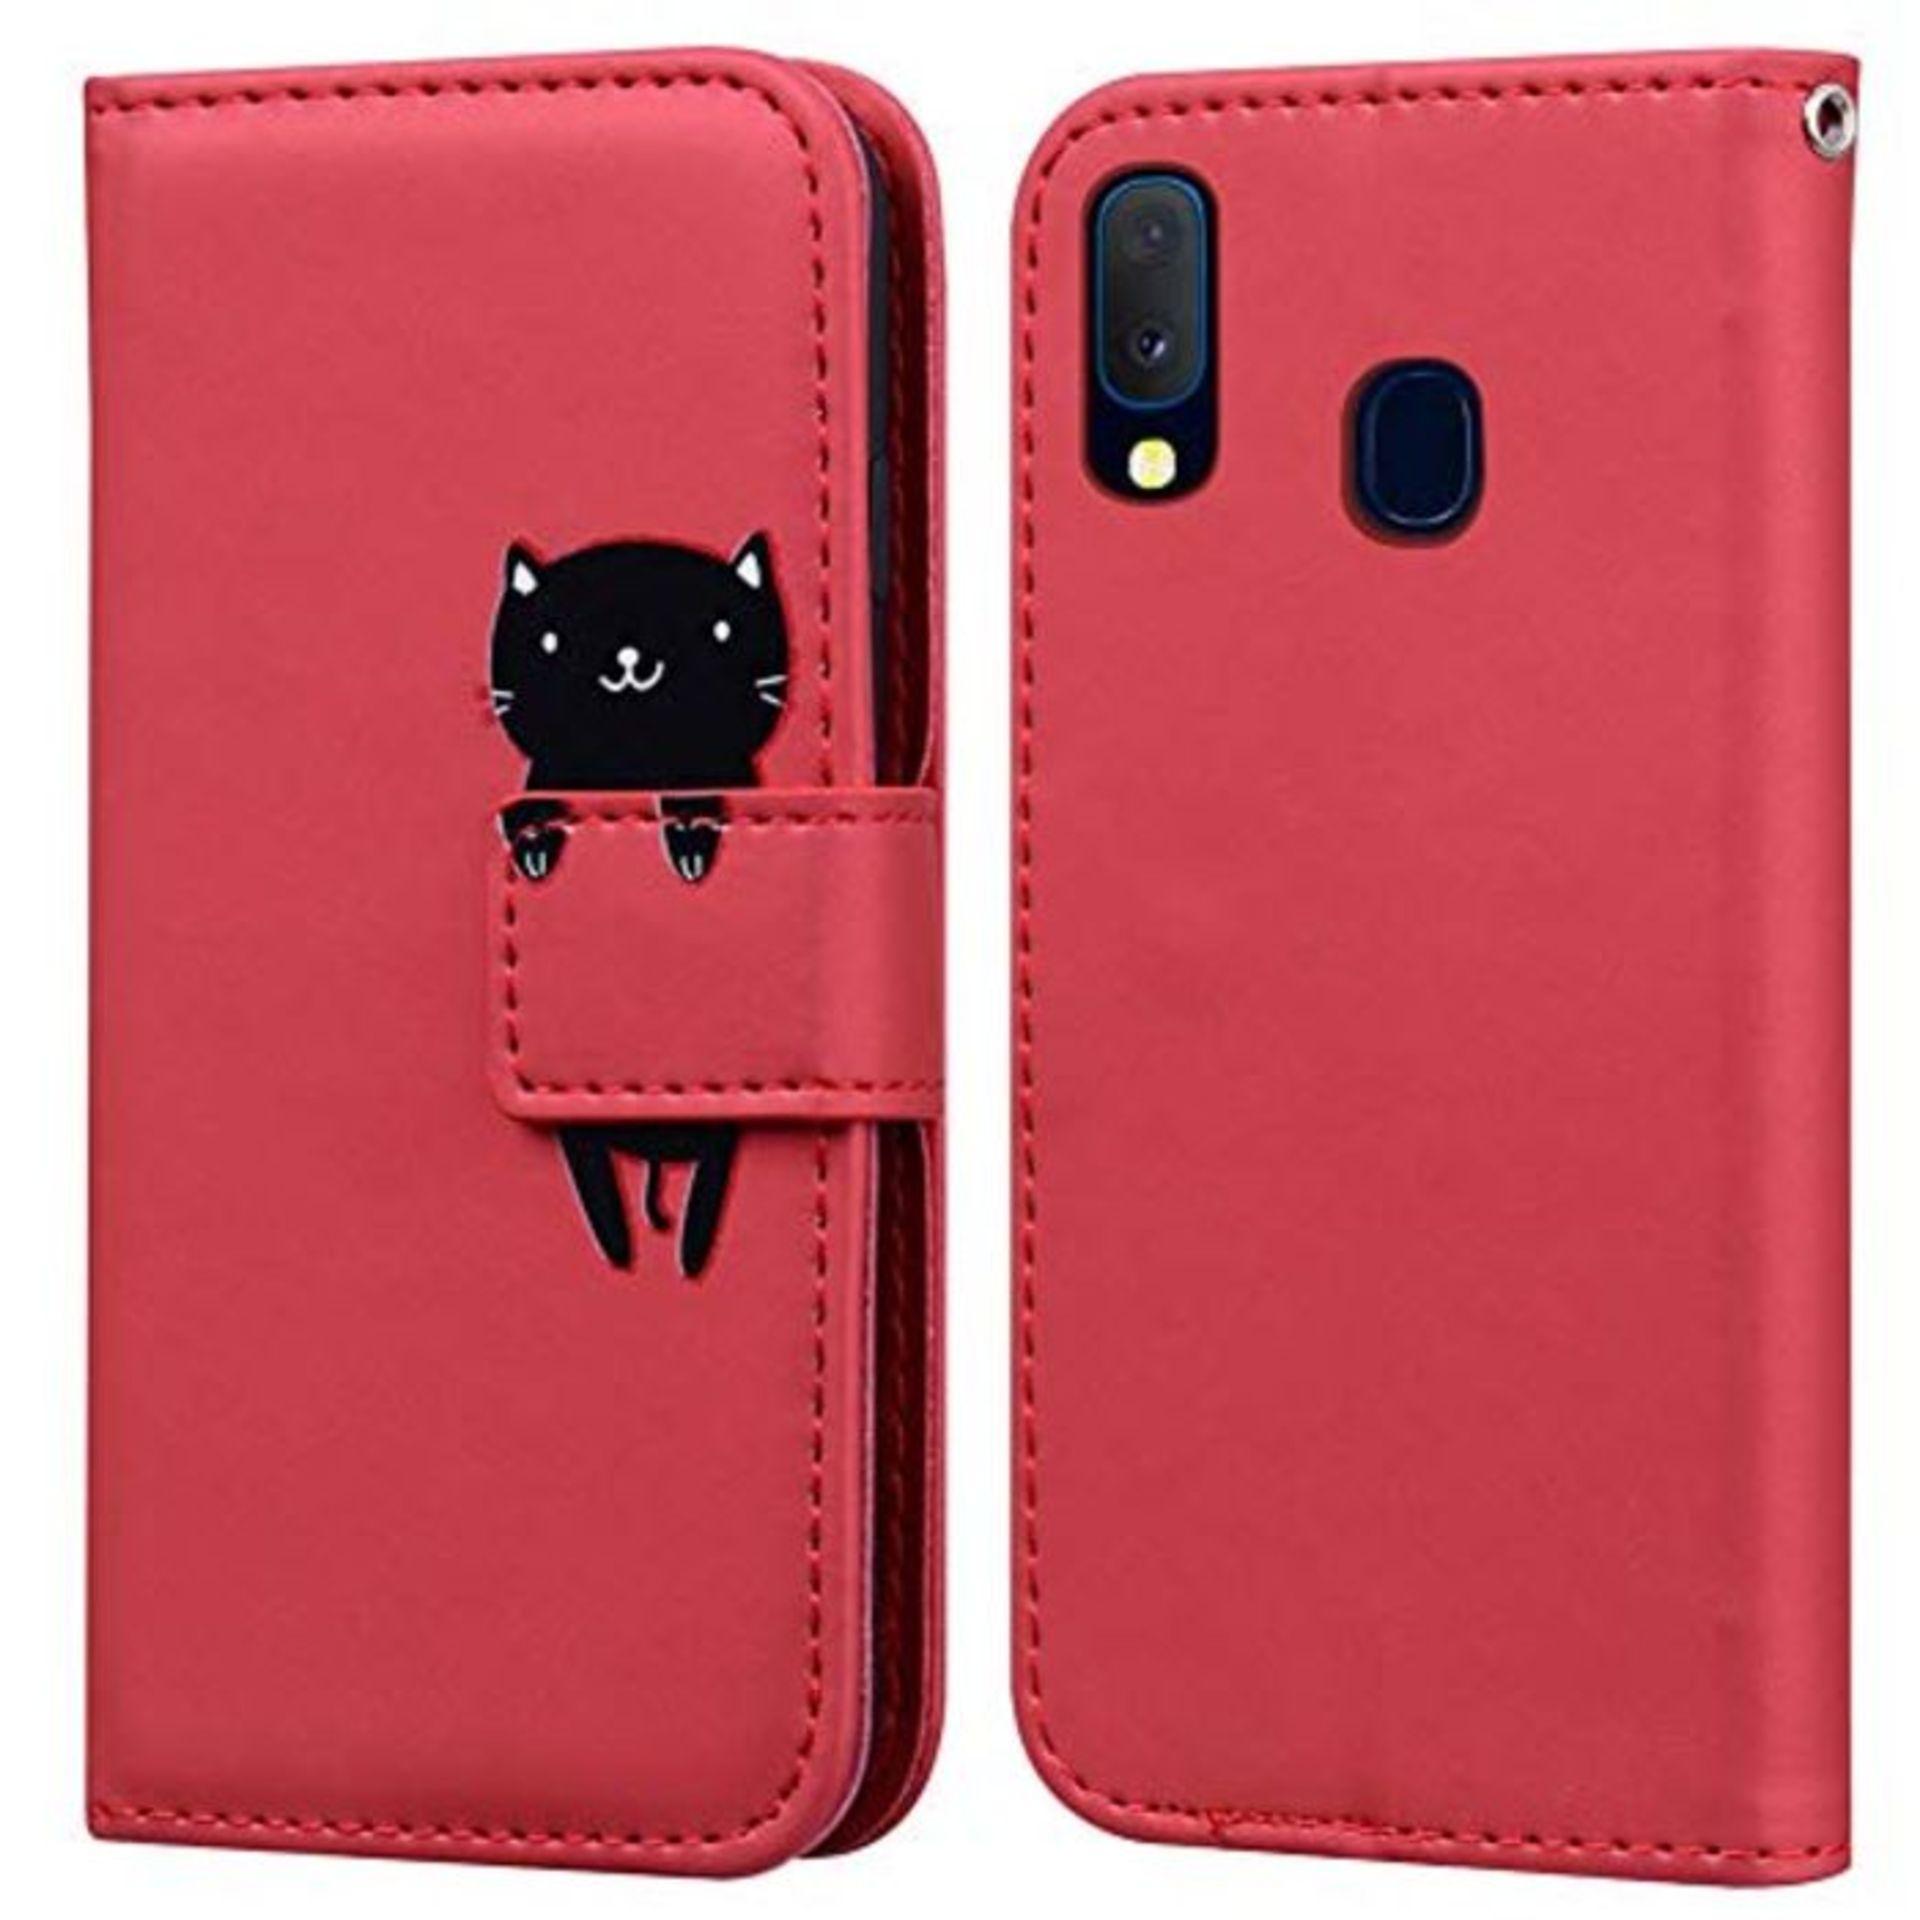 Ailisi Galaxy A20e Case, Cute Cartoon Animal Leather Wallet flip case Creative magneti